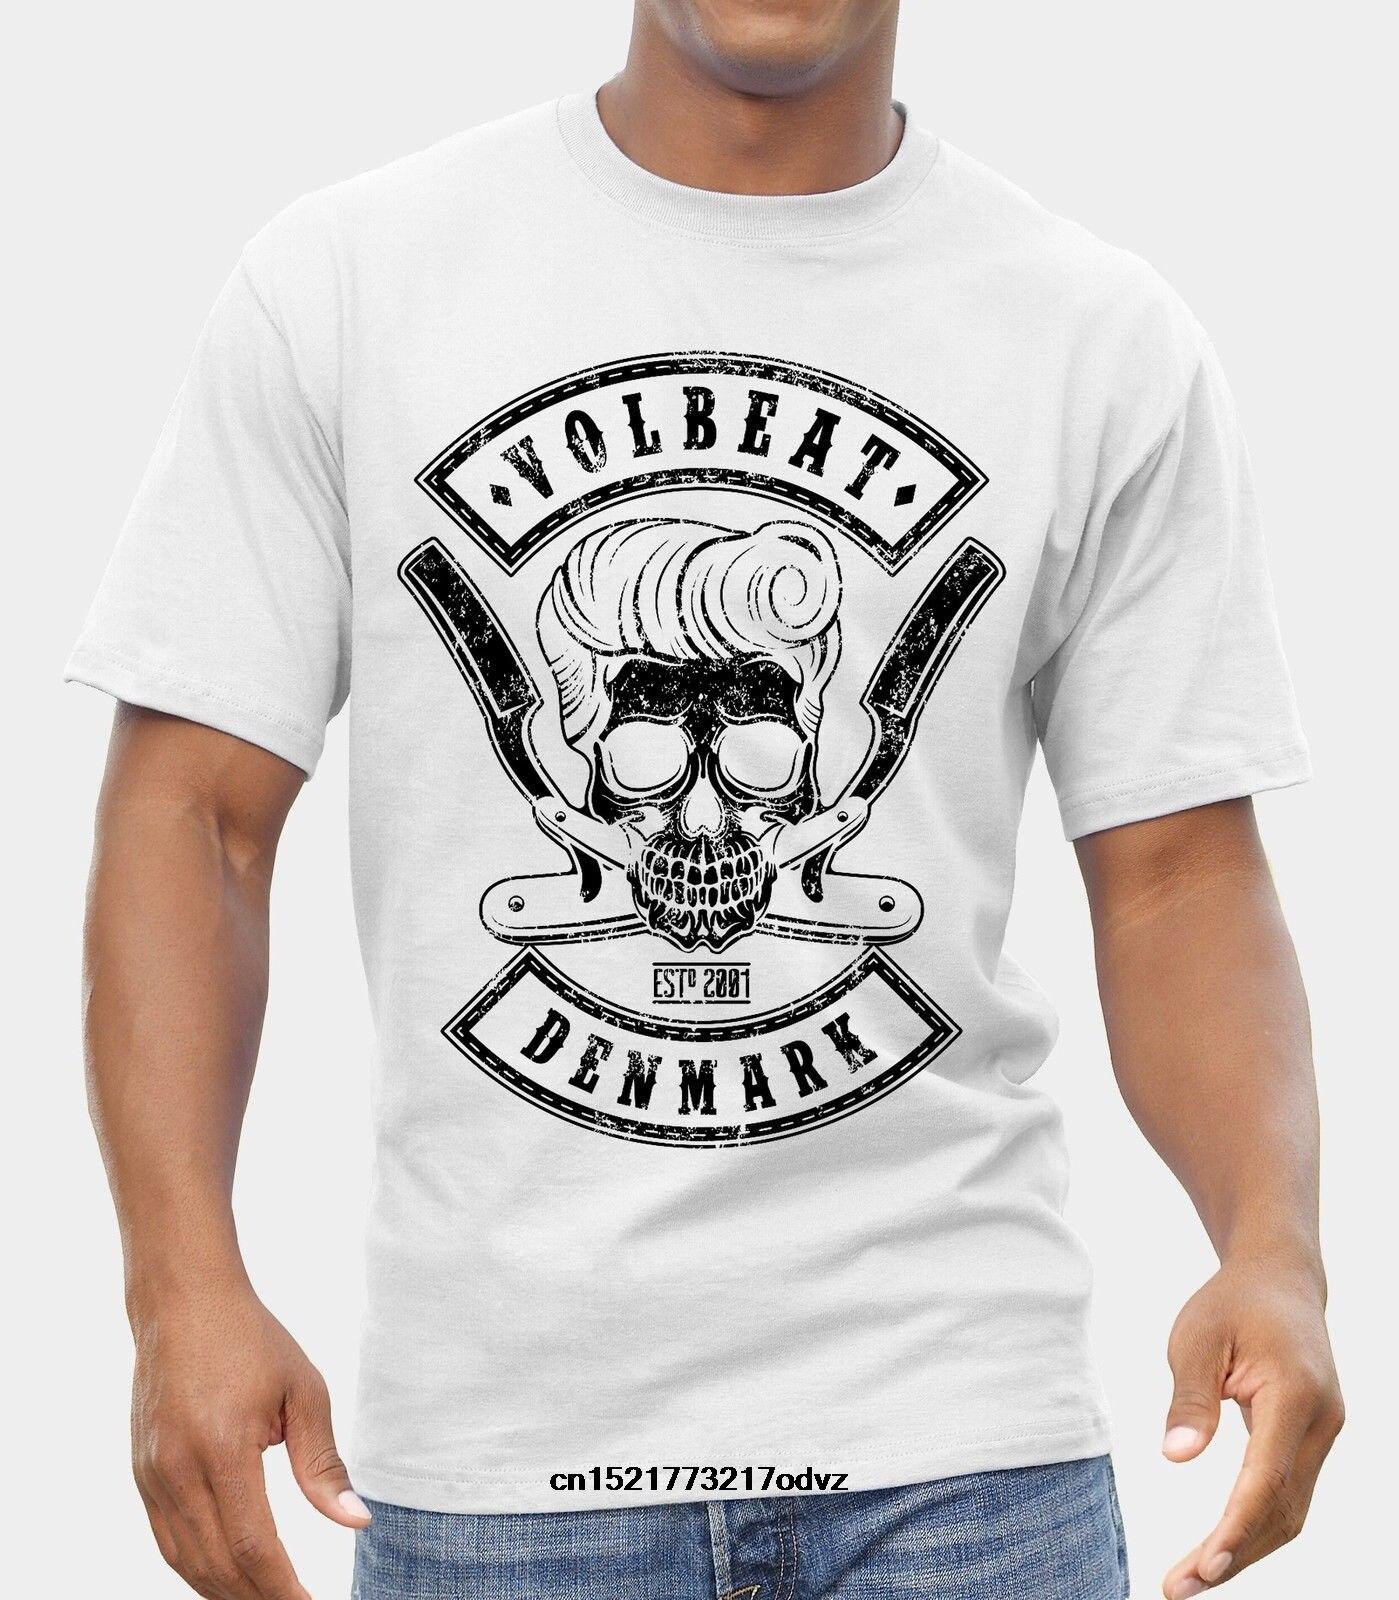 VOLBEAT Skull Men Black T-shirt Rock Band Fan Tee Shirt Gift